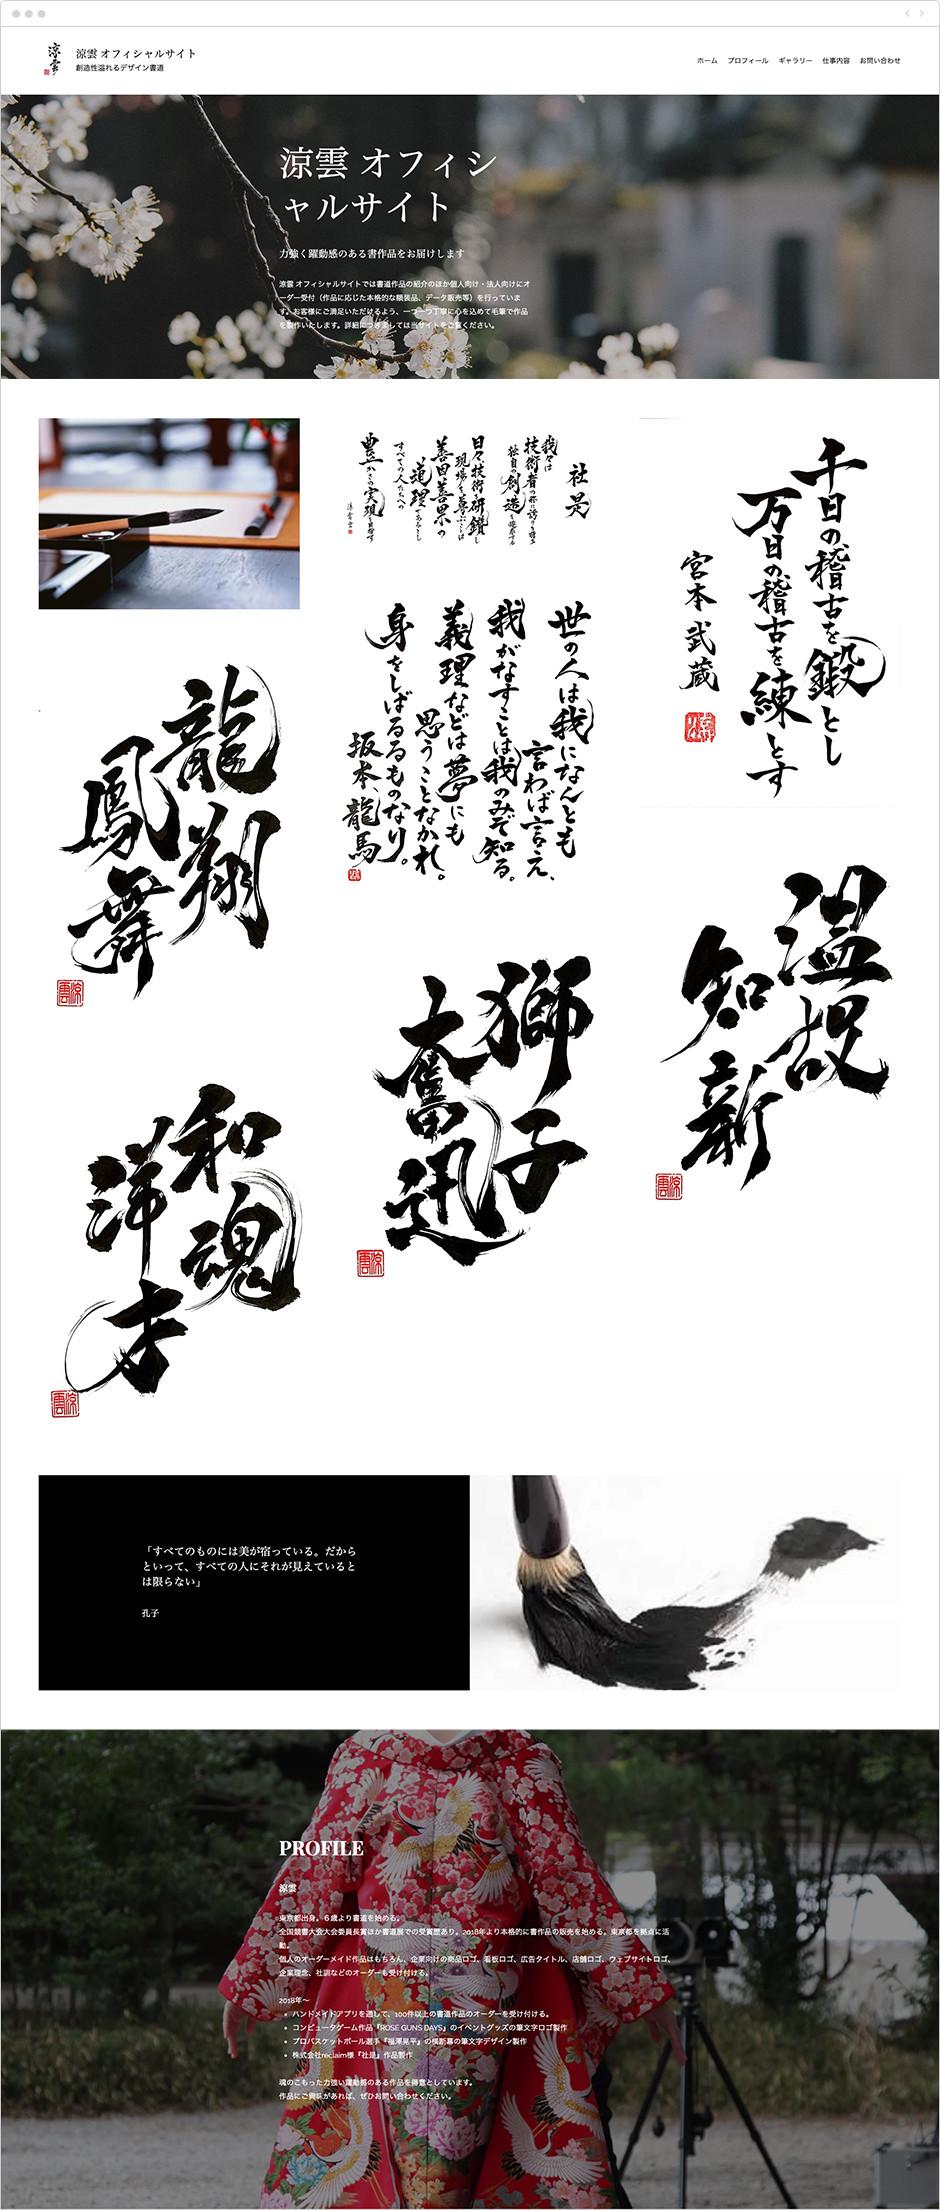 Wix ADI サイト事例 涼雲 オフィシャルサイト